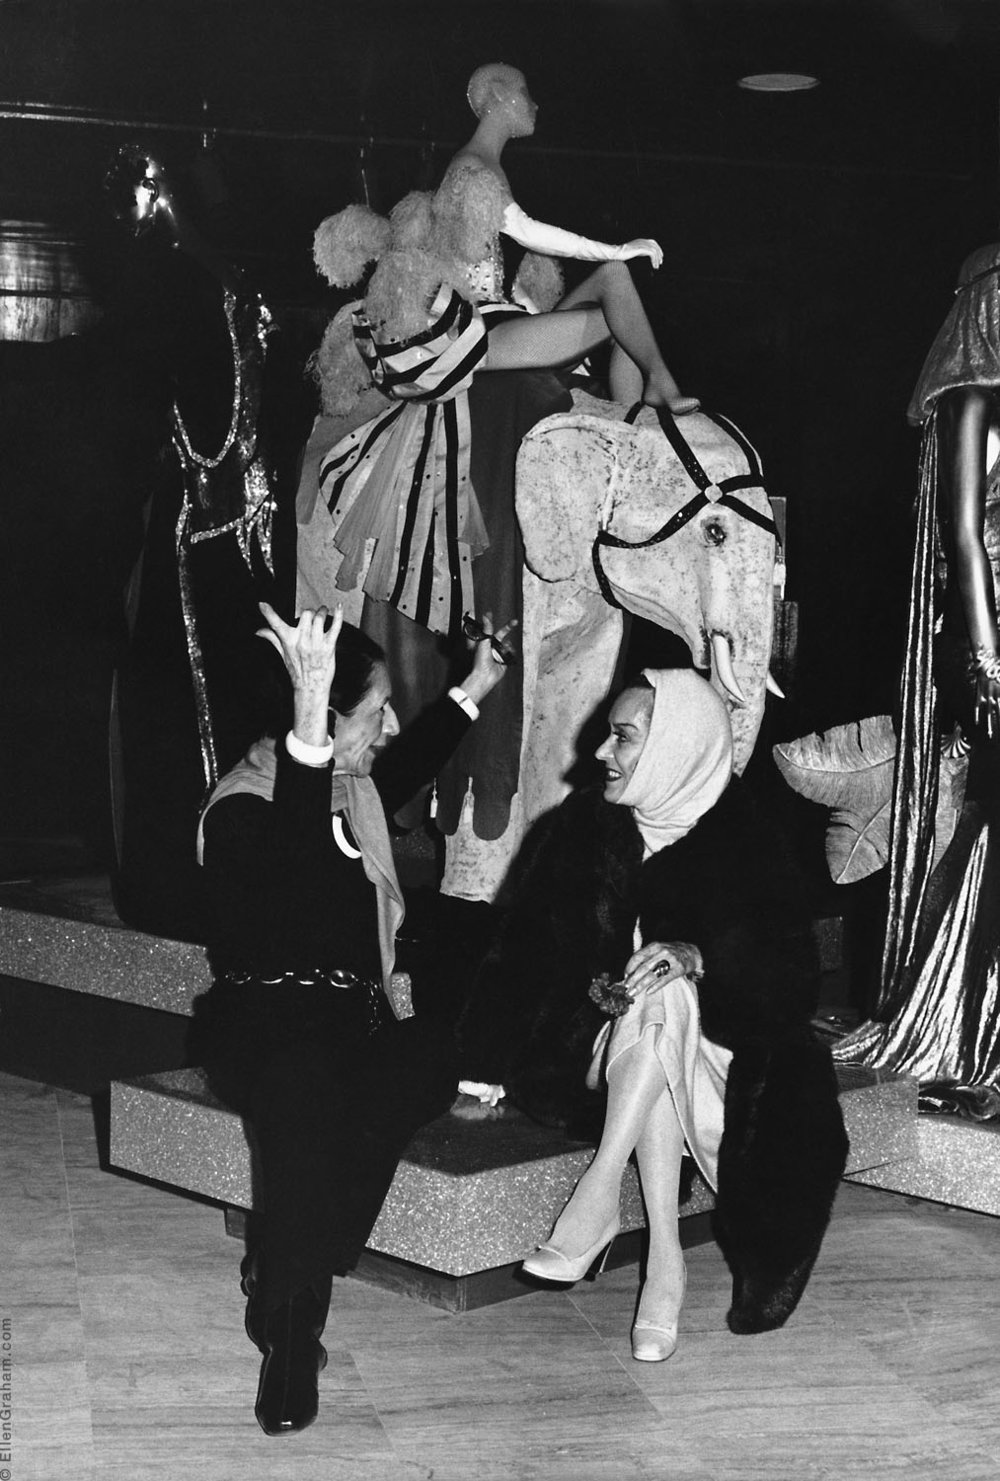 Diana Vreeland, Gloria Swanson, The Costume Institute, The Metropolitan Museum of Art, New York, NY, 1975